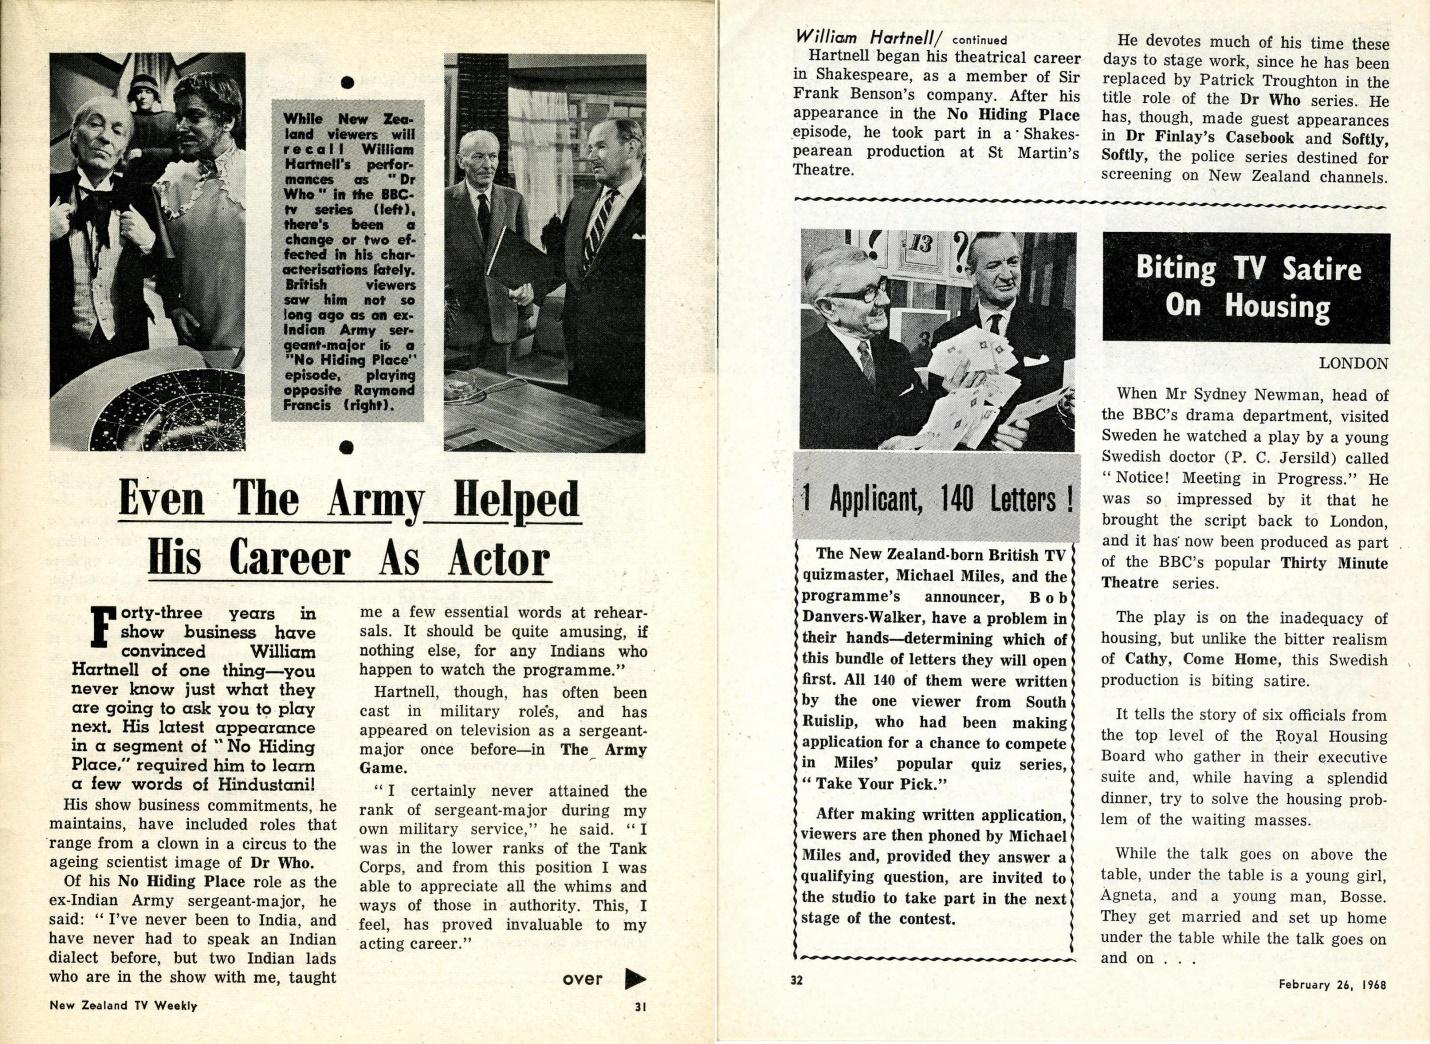 New Zealand TV Weekly, 26 February 1968